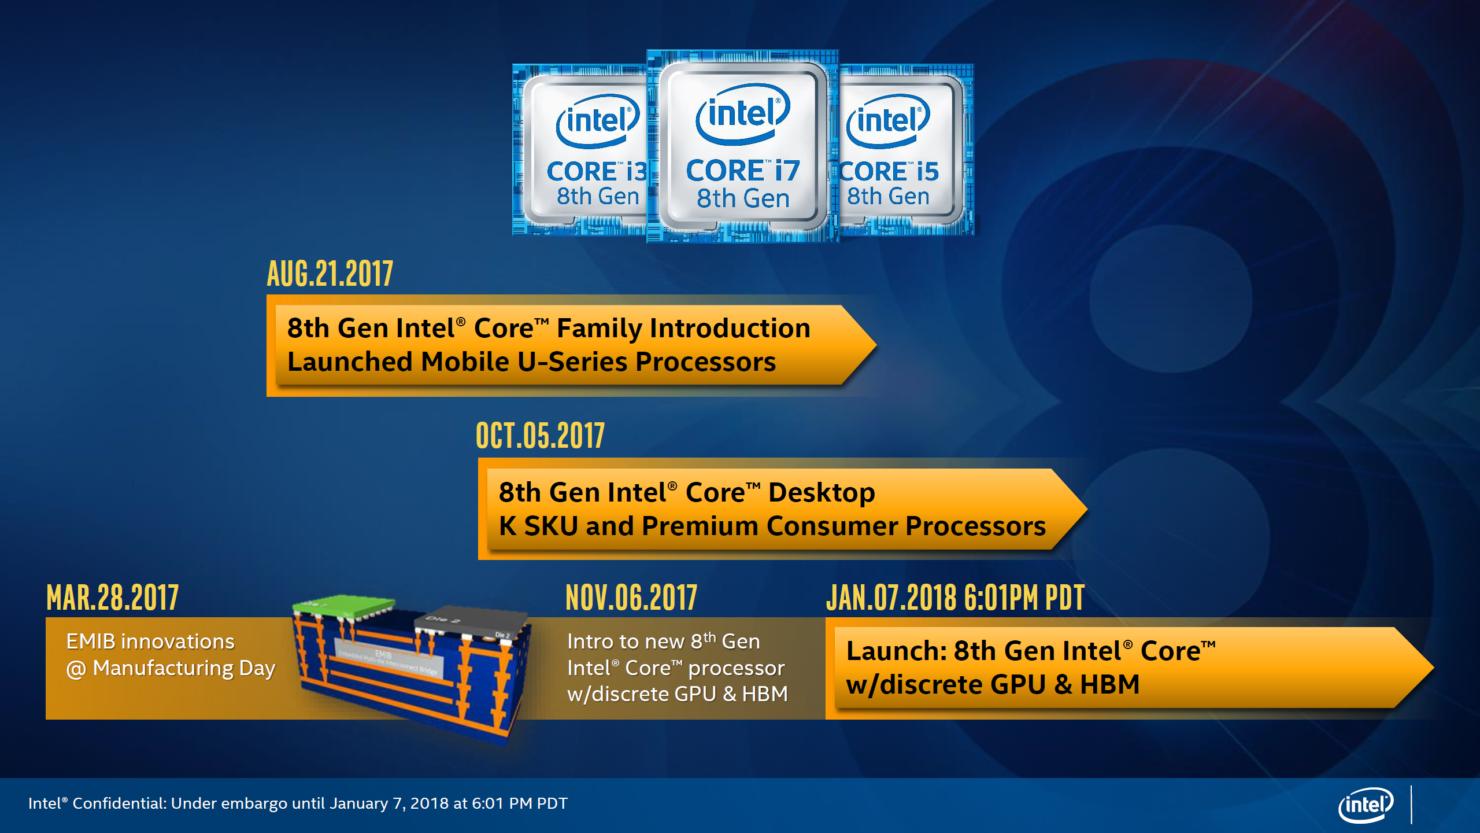 intel-8th-generation-core-processors-with-amd-radeon-rx-vega-m-graphics_2